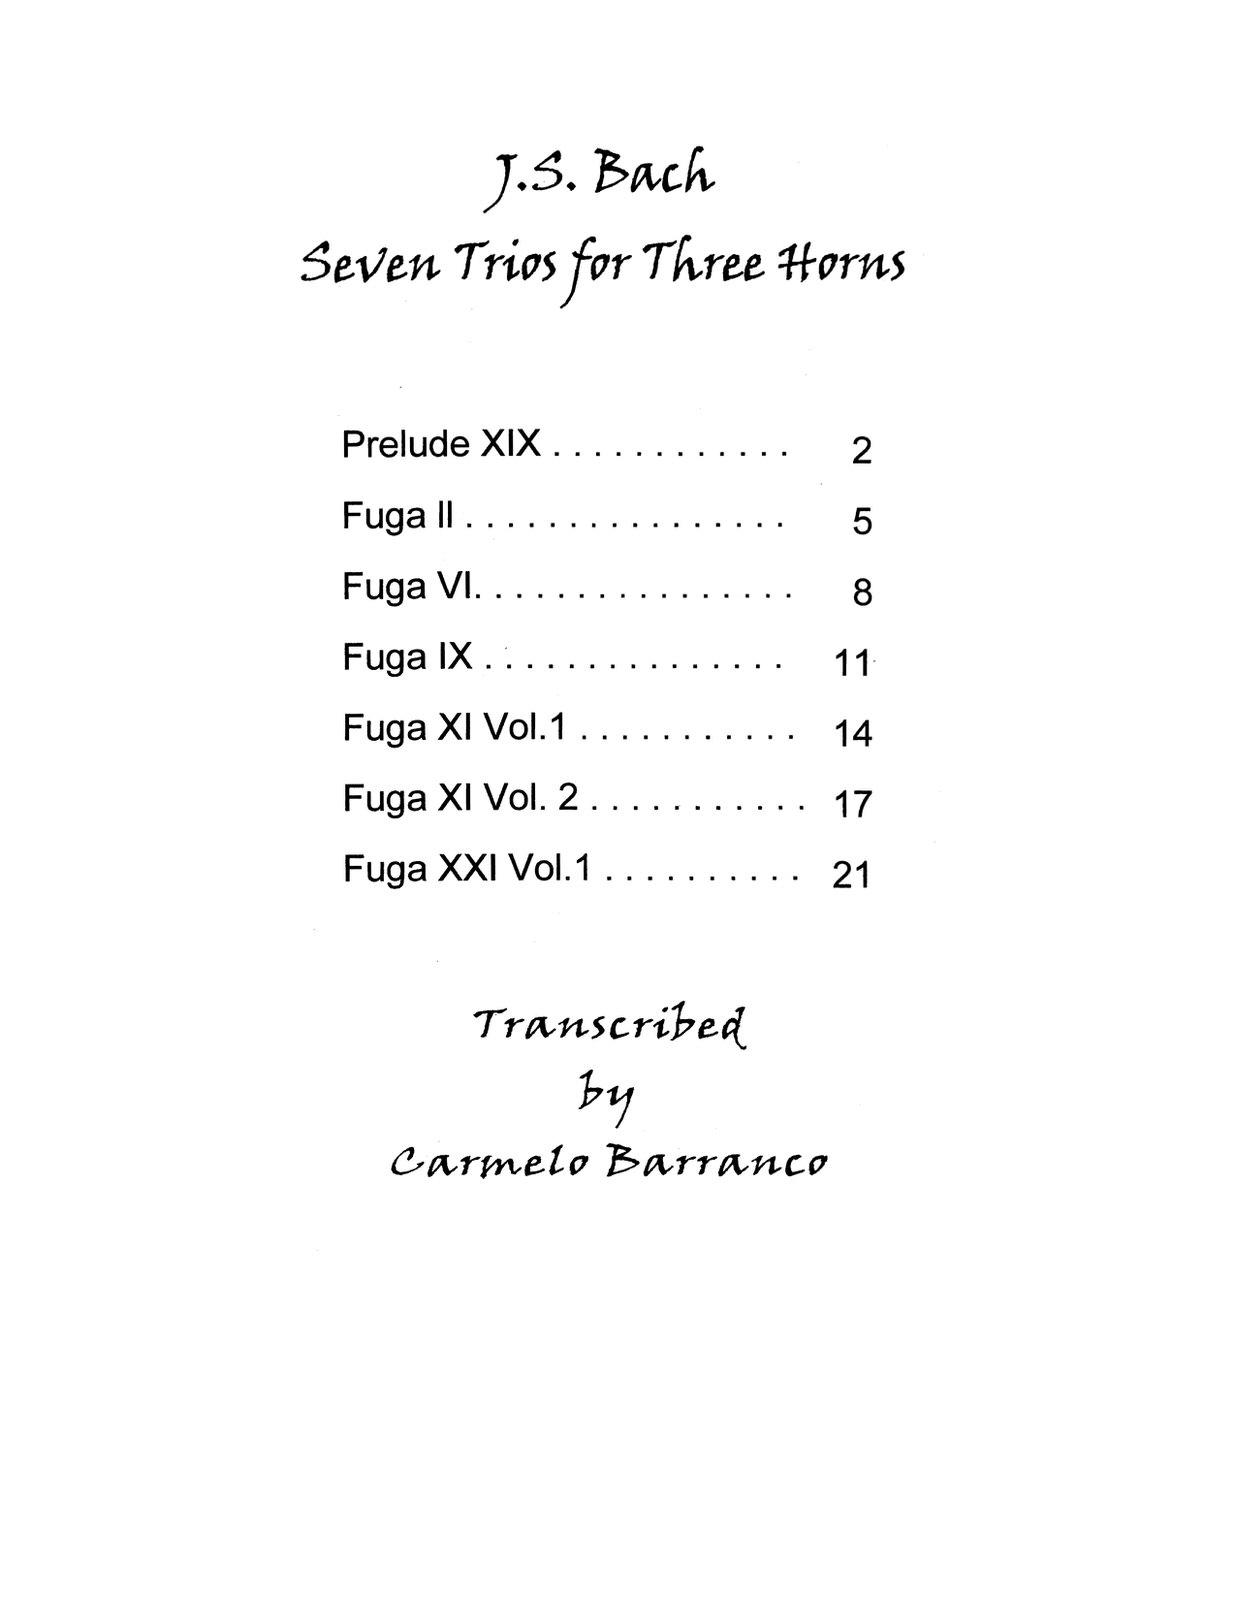 Barranco-Bach, 7 Bach Trios-p05